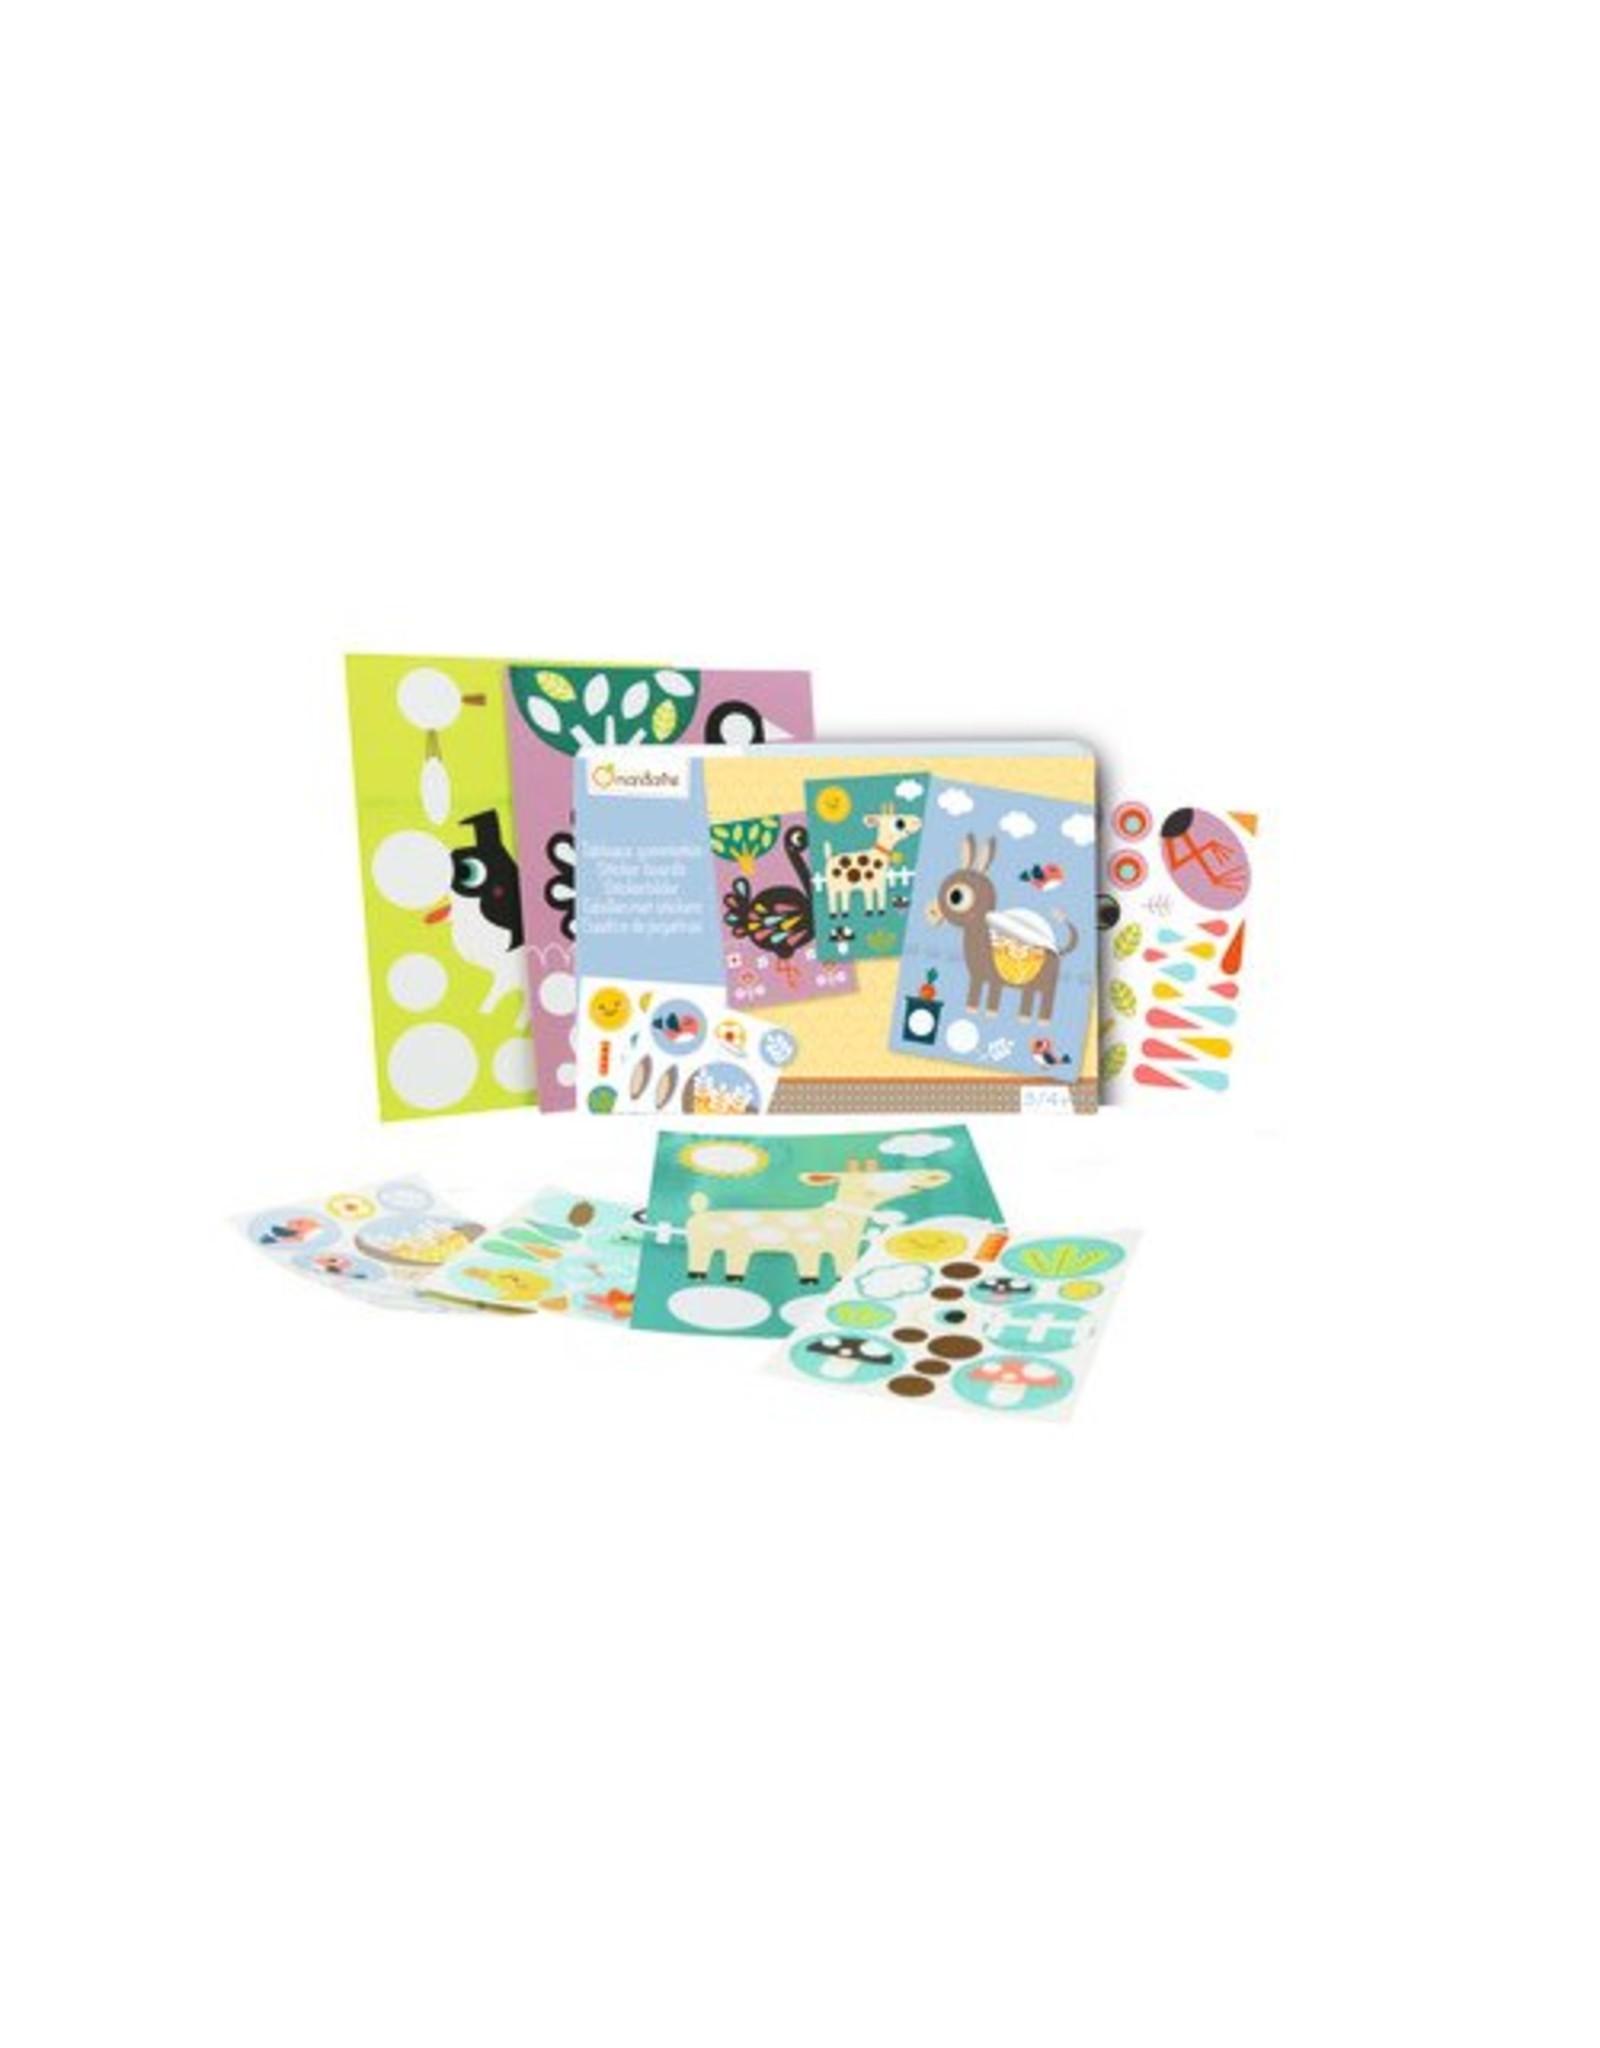 Avenue Mandarine Creatieve box stickers, huisdieren